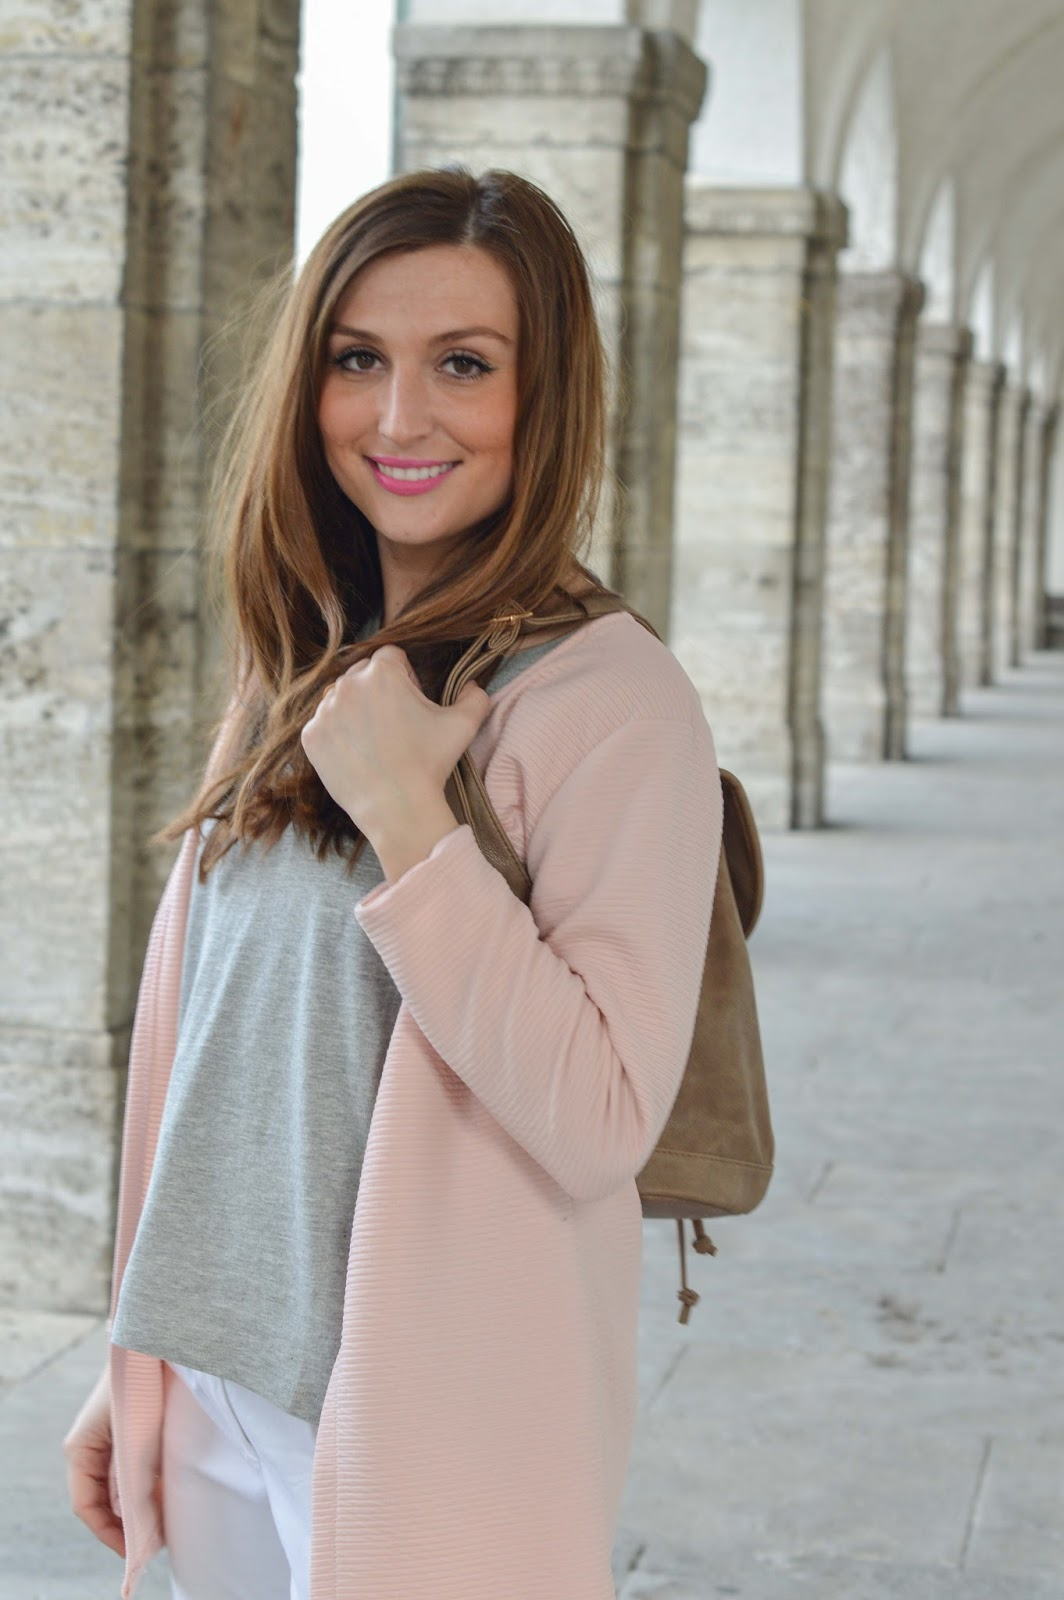 casual blogger look - casual look - rosa mantel - rosa sneaker - fashionblogger aus deutschland - deutsche fashionblogger - frankfurt blogger - blogger aus Frankfurt -lifestyleblogger